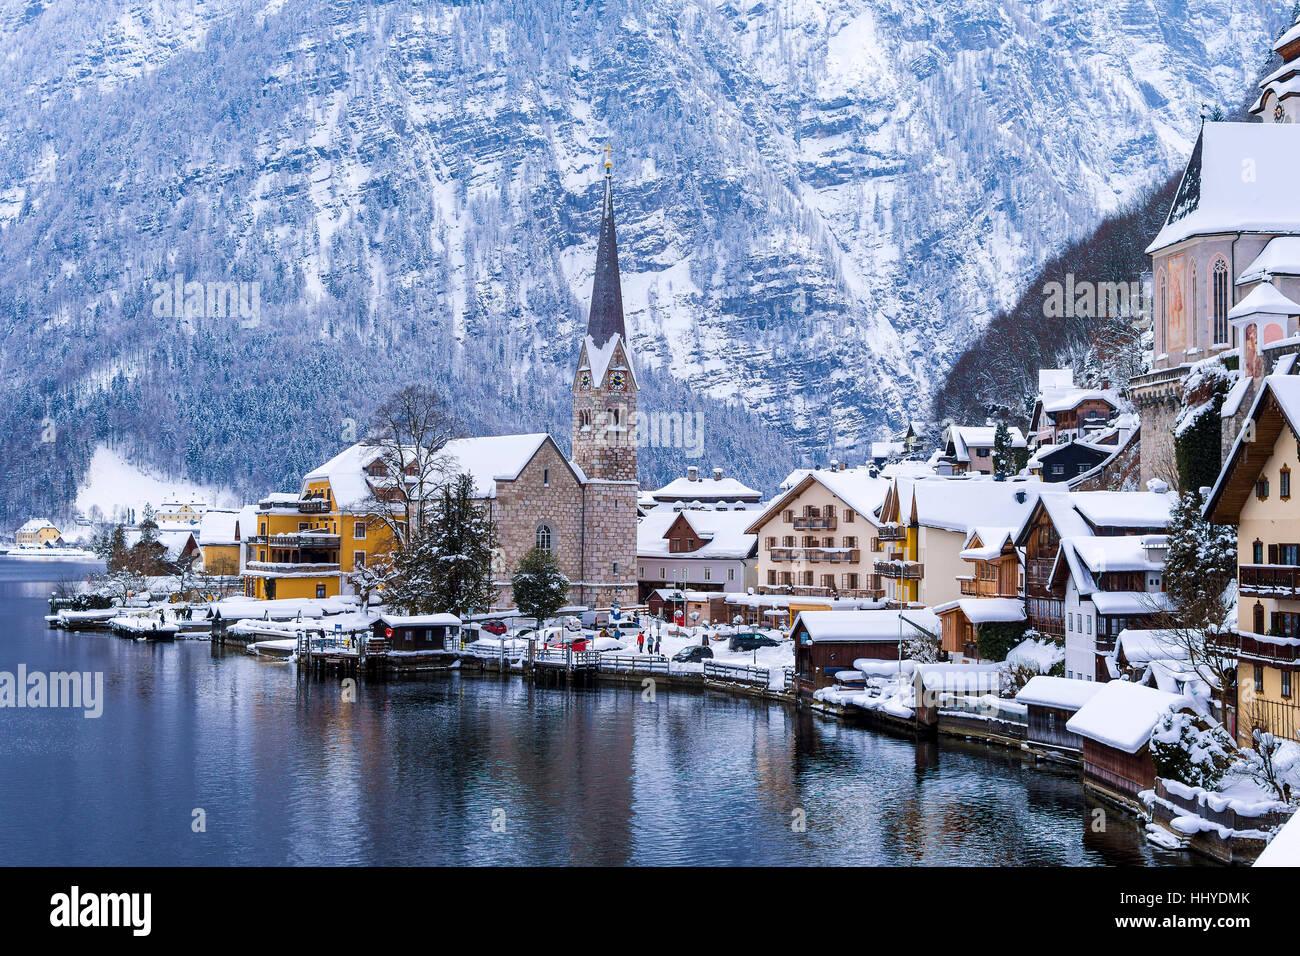 Falling Water Live Wallpaper Hallstatt And Hallstatterr See Mountain Lake Winter Day